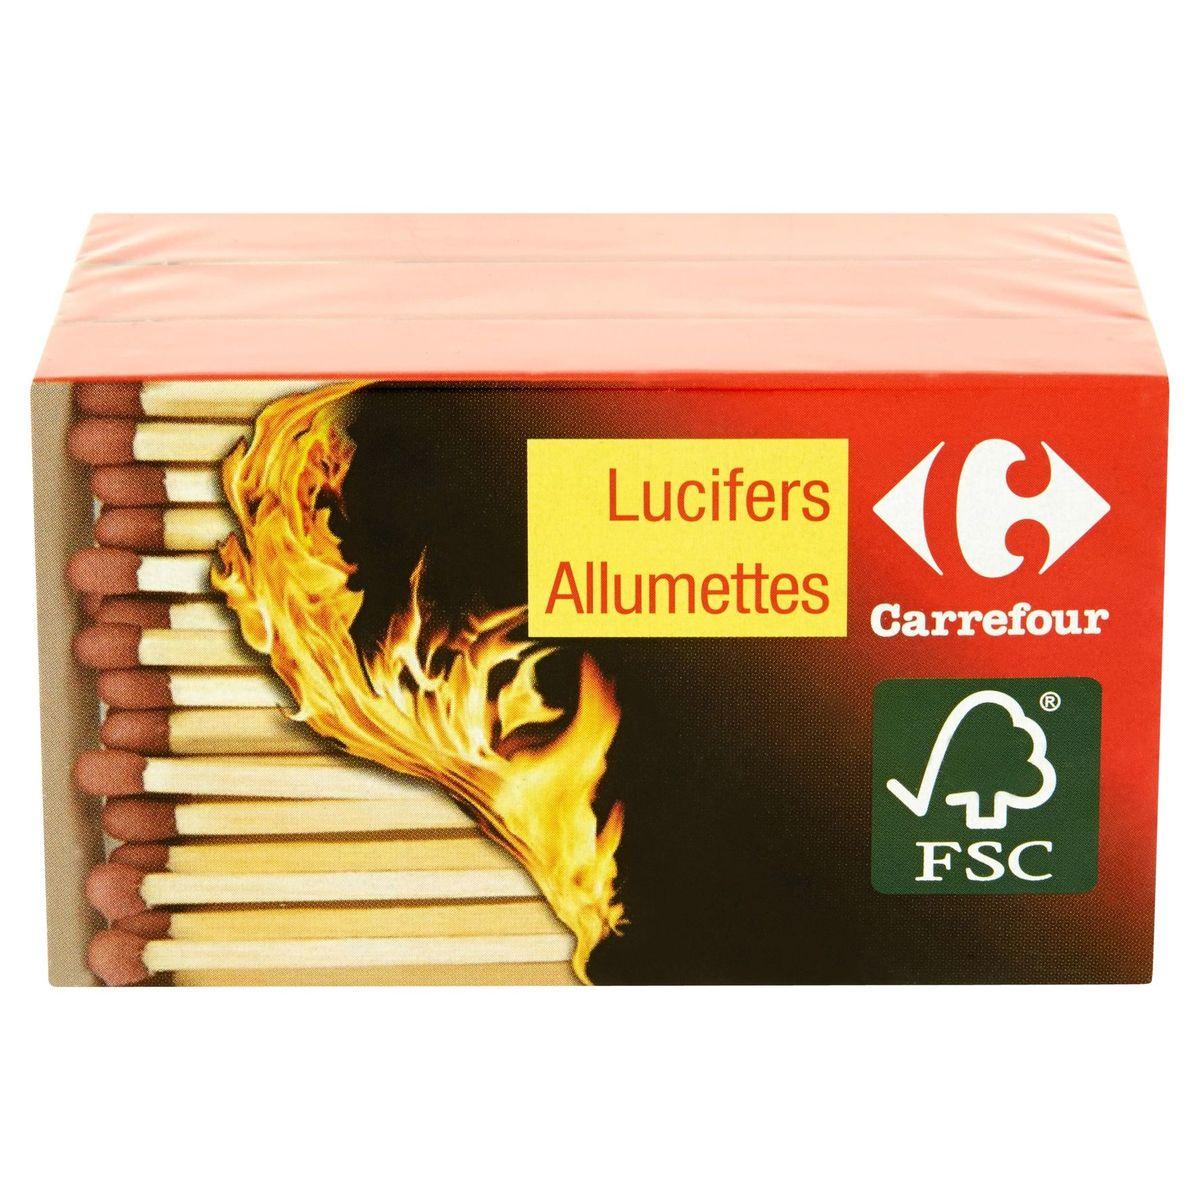 Carrefour Lucifers x3